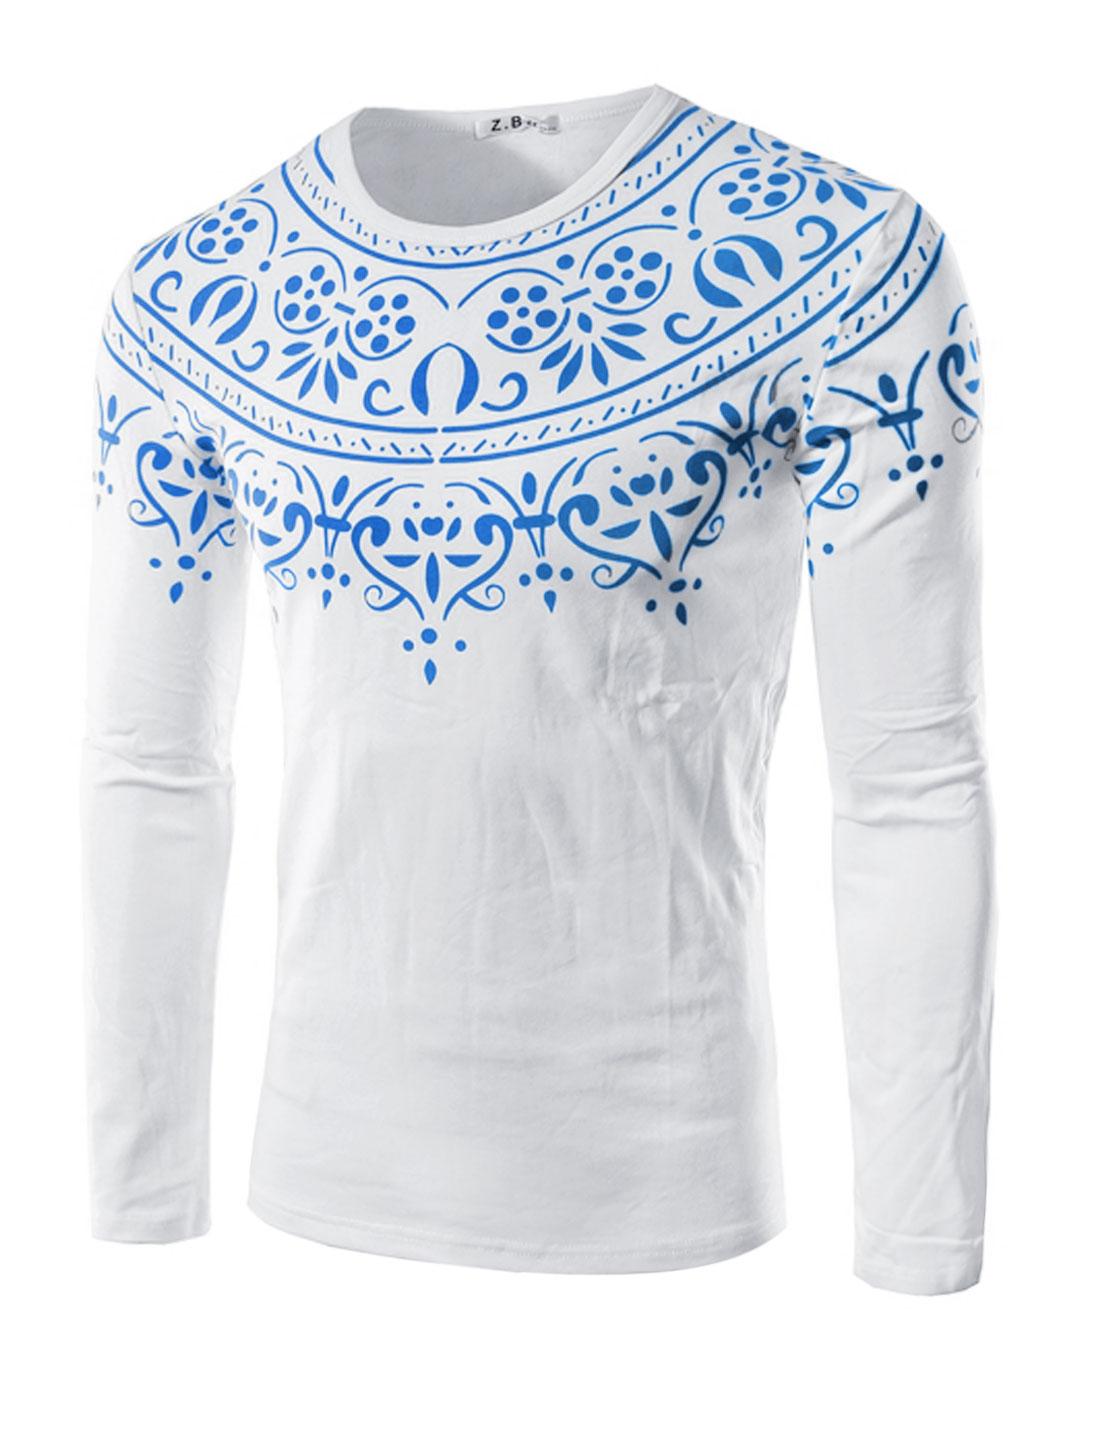 Men Long Sleeves Slim Fit Novelty Tee Shirt White M